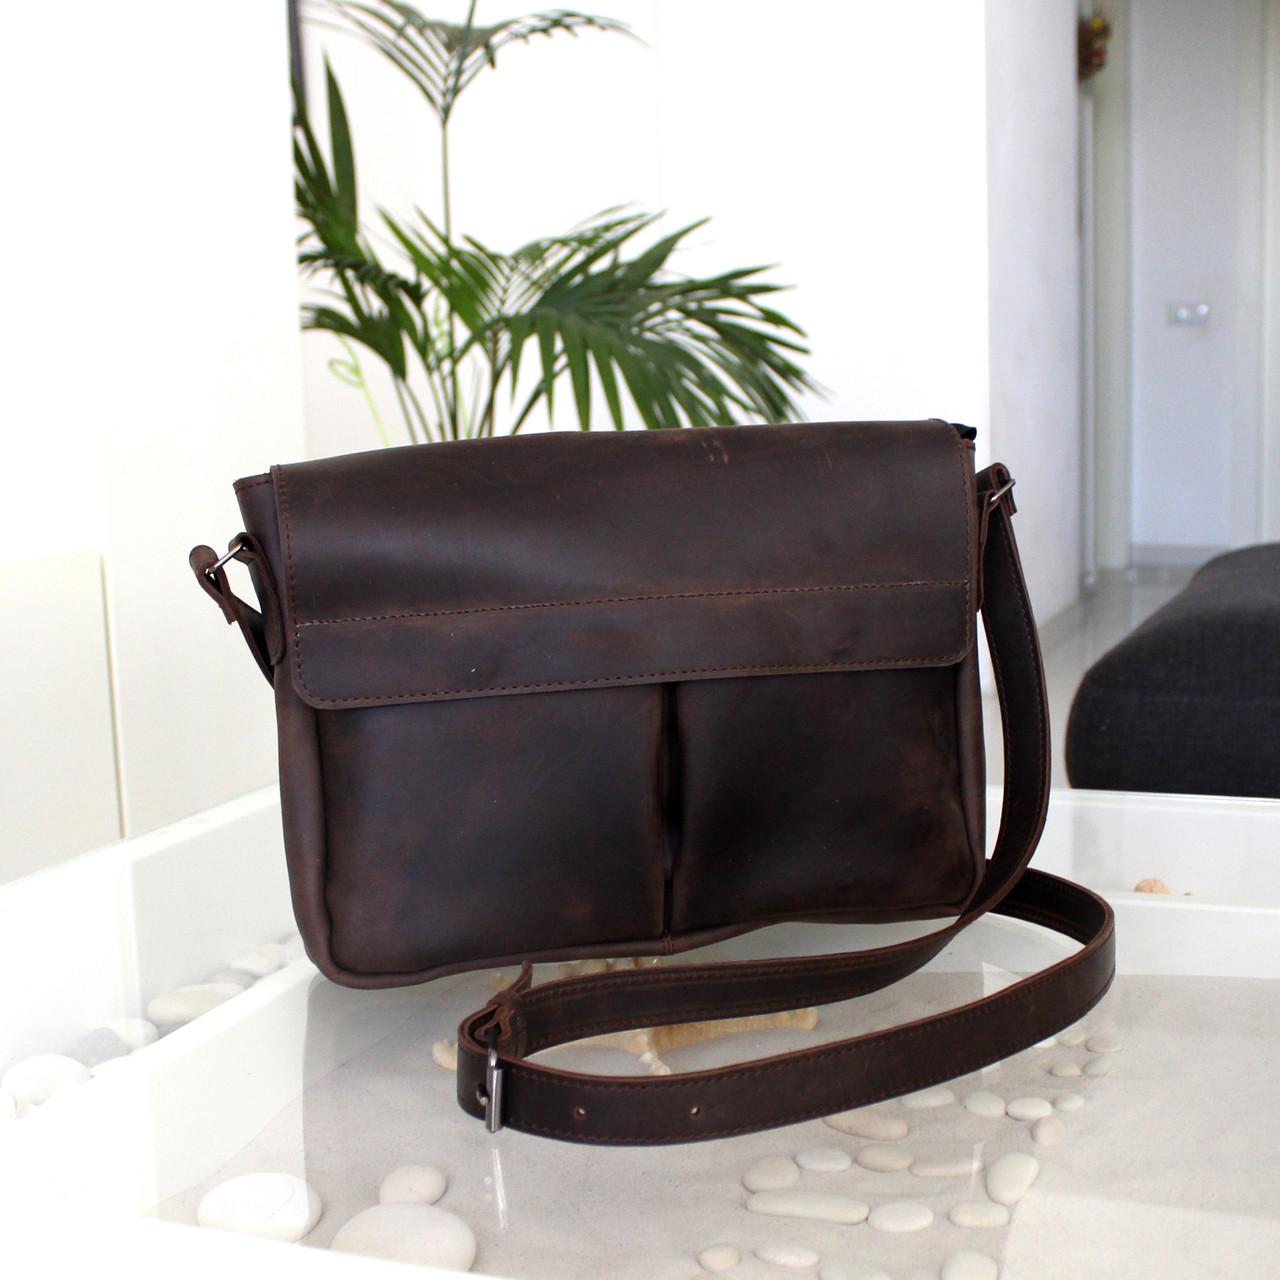 7c997a895740 Мужская кожаная сумка